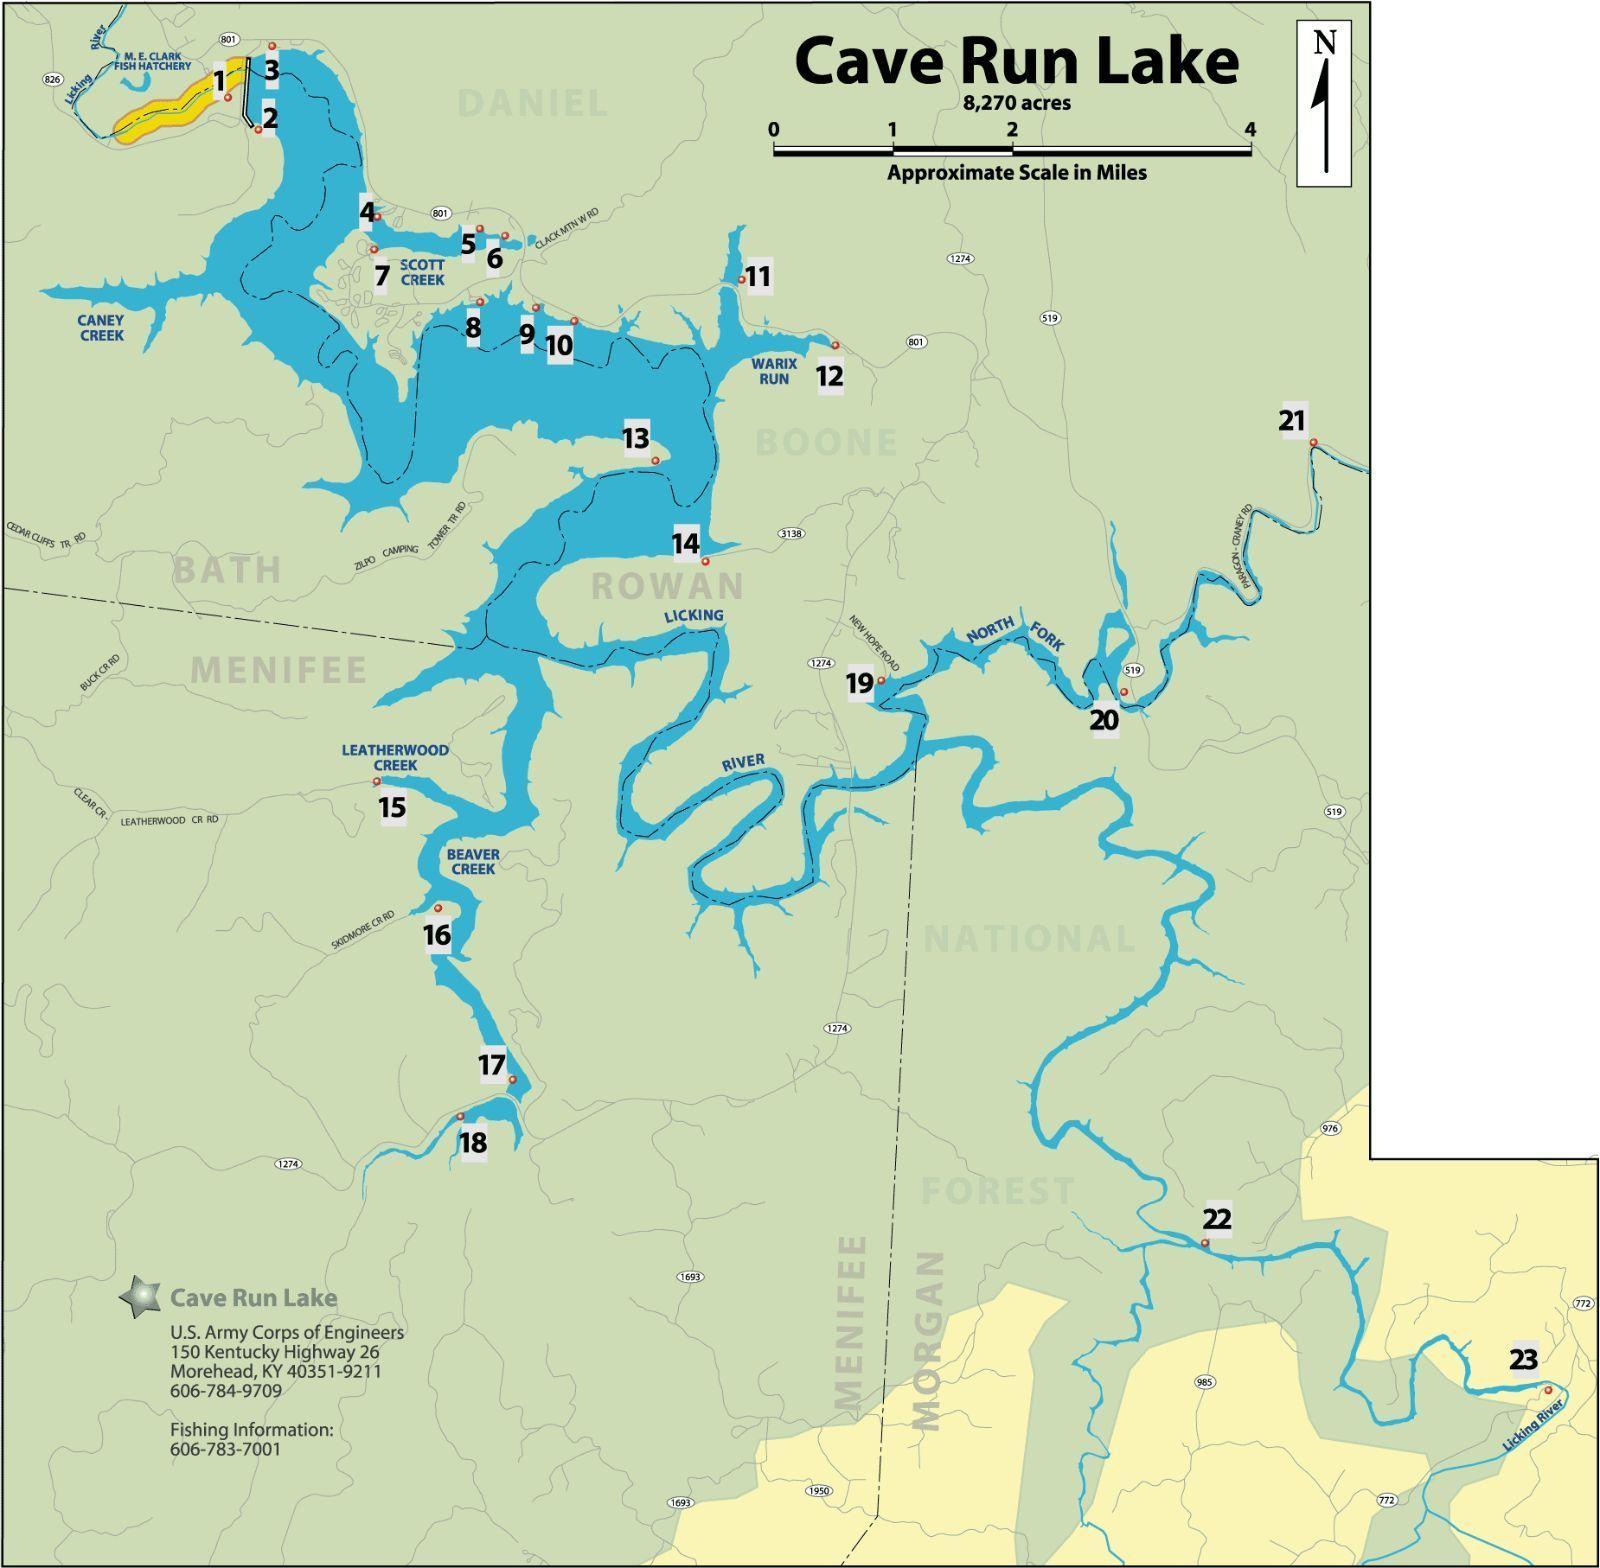 CAVE RUN LAKE DANIEL BOONE NATIONAL FOREST KENTUCKY BEACH